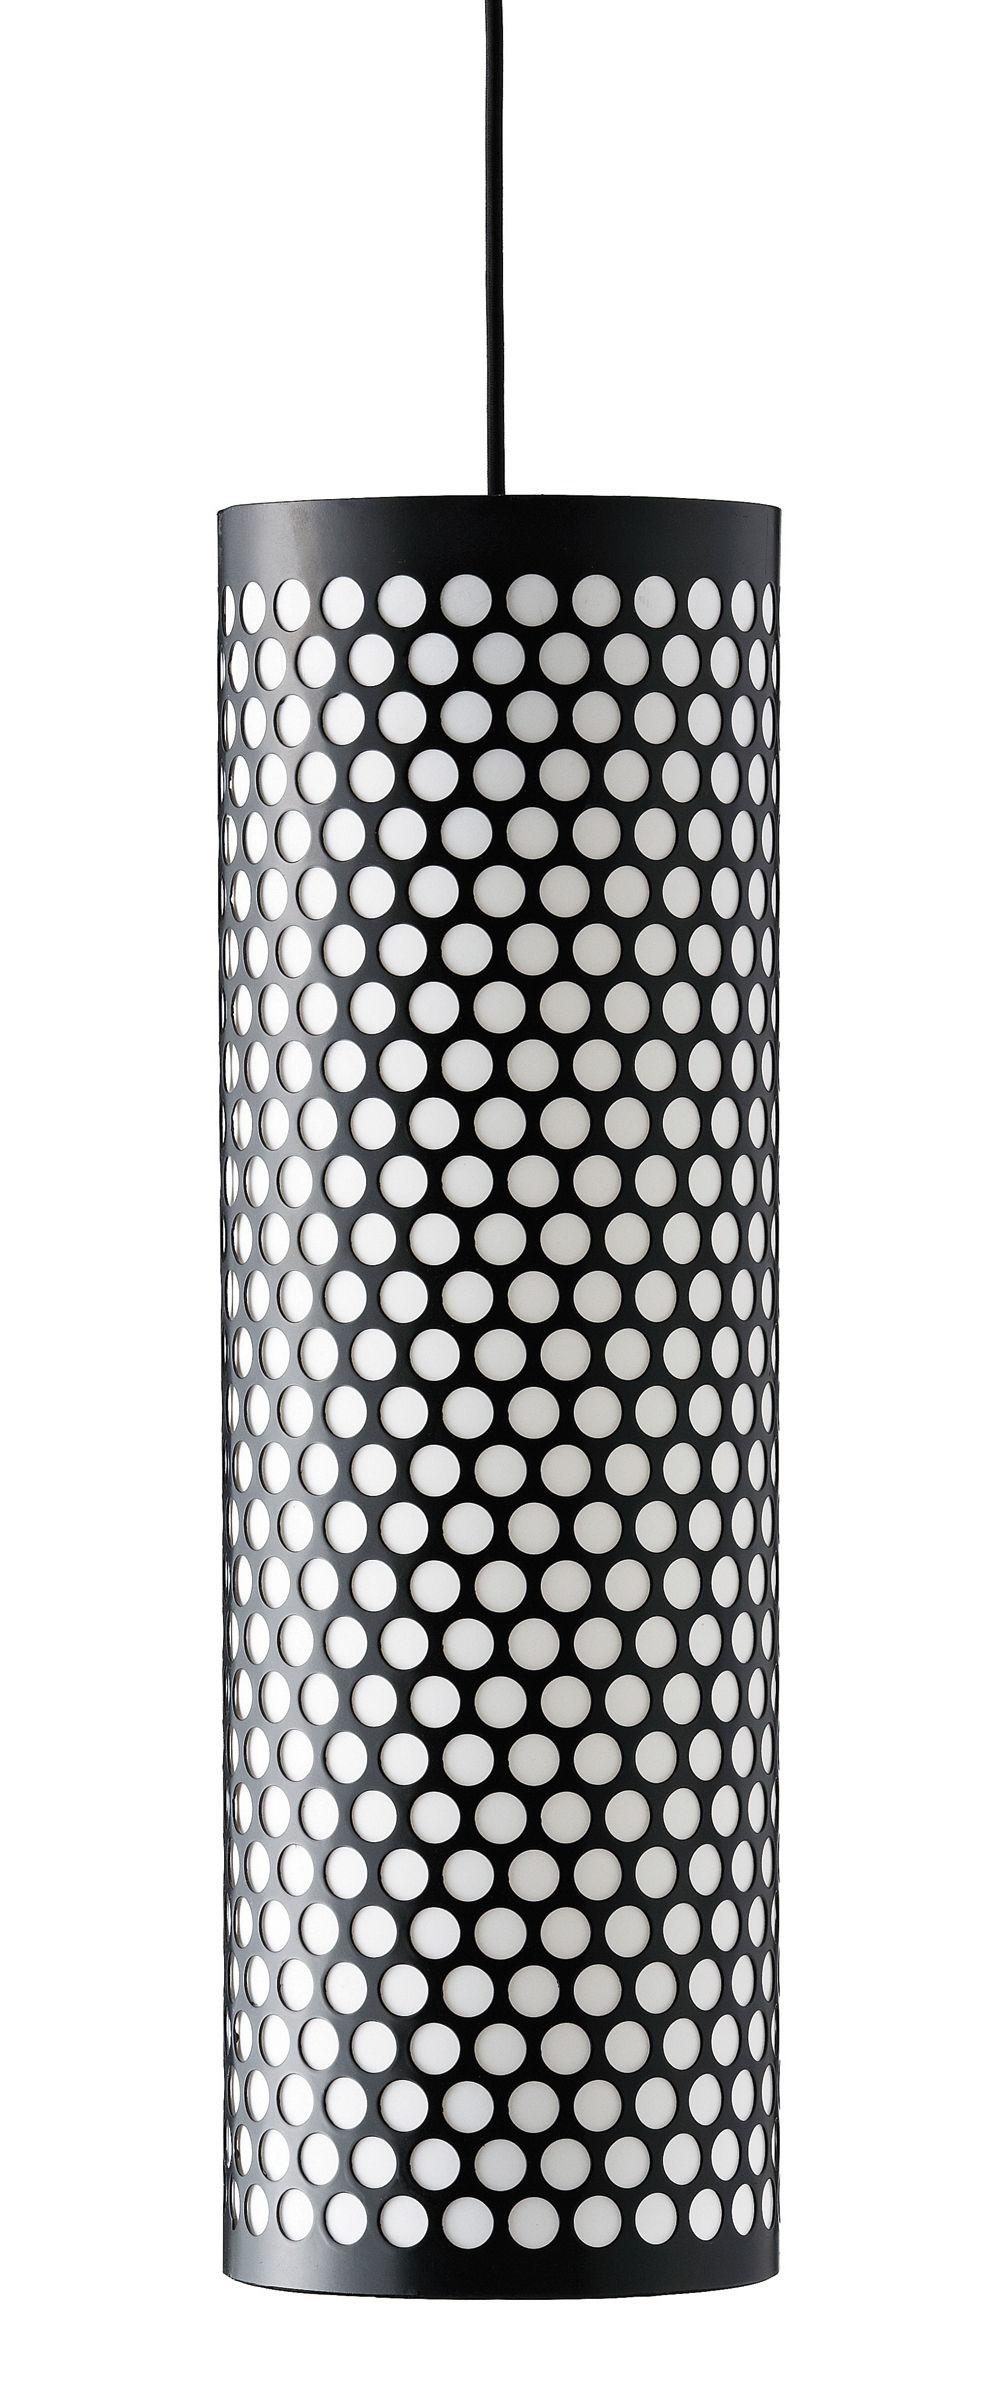 Lighting - Pendant Lighting - Pedrera ANA Pendant - Ø 20 x H 63 cm by Gubi - Black - Metal, Polythene